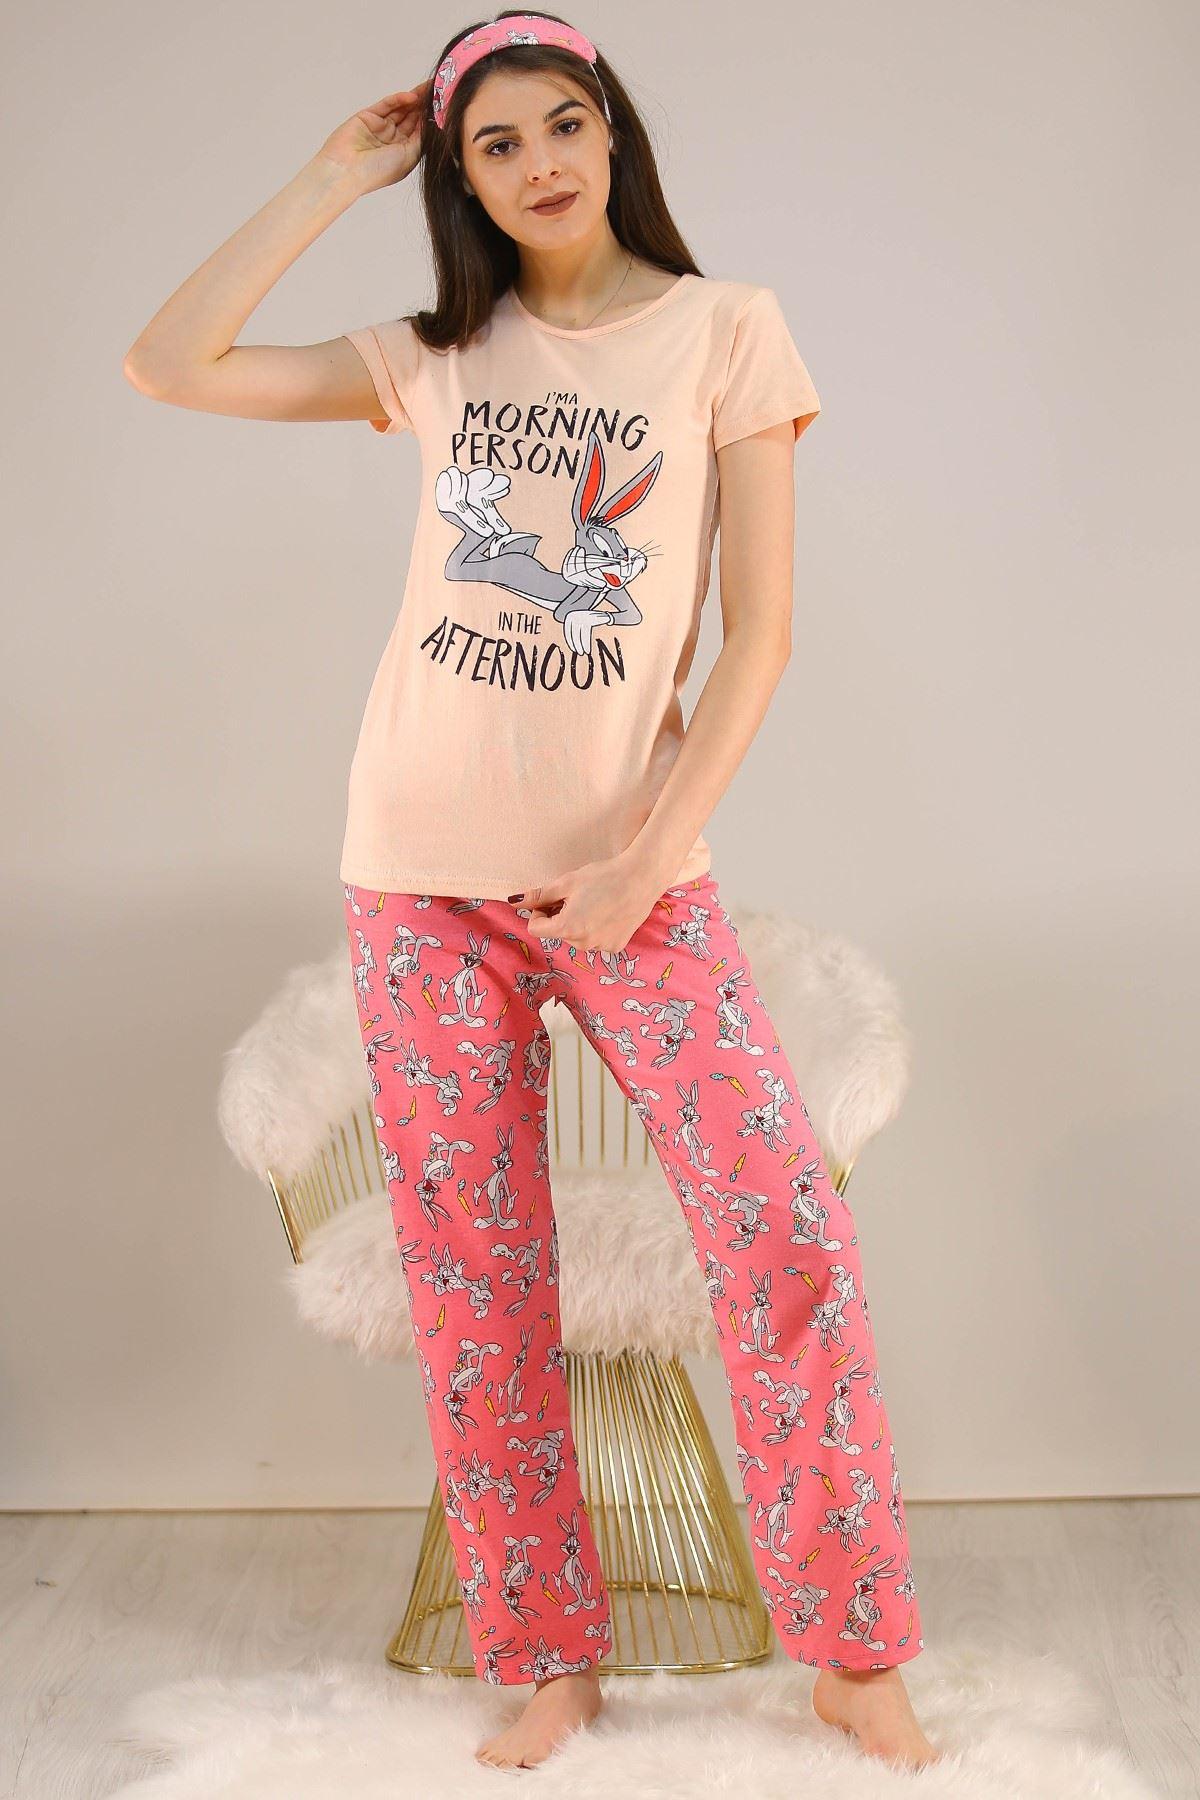 Baskılı Pijama Takımı Pudra - 5149.102.